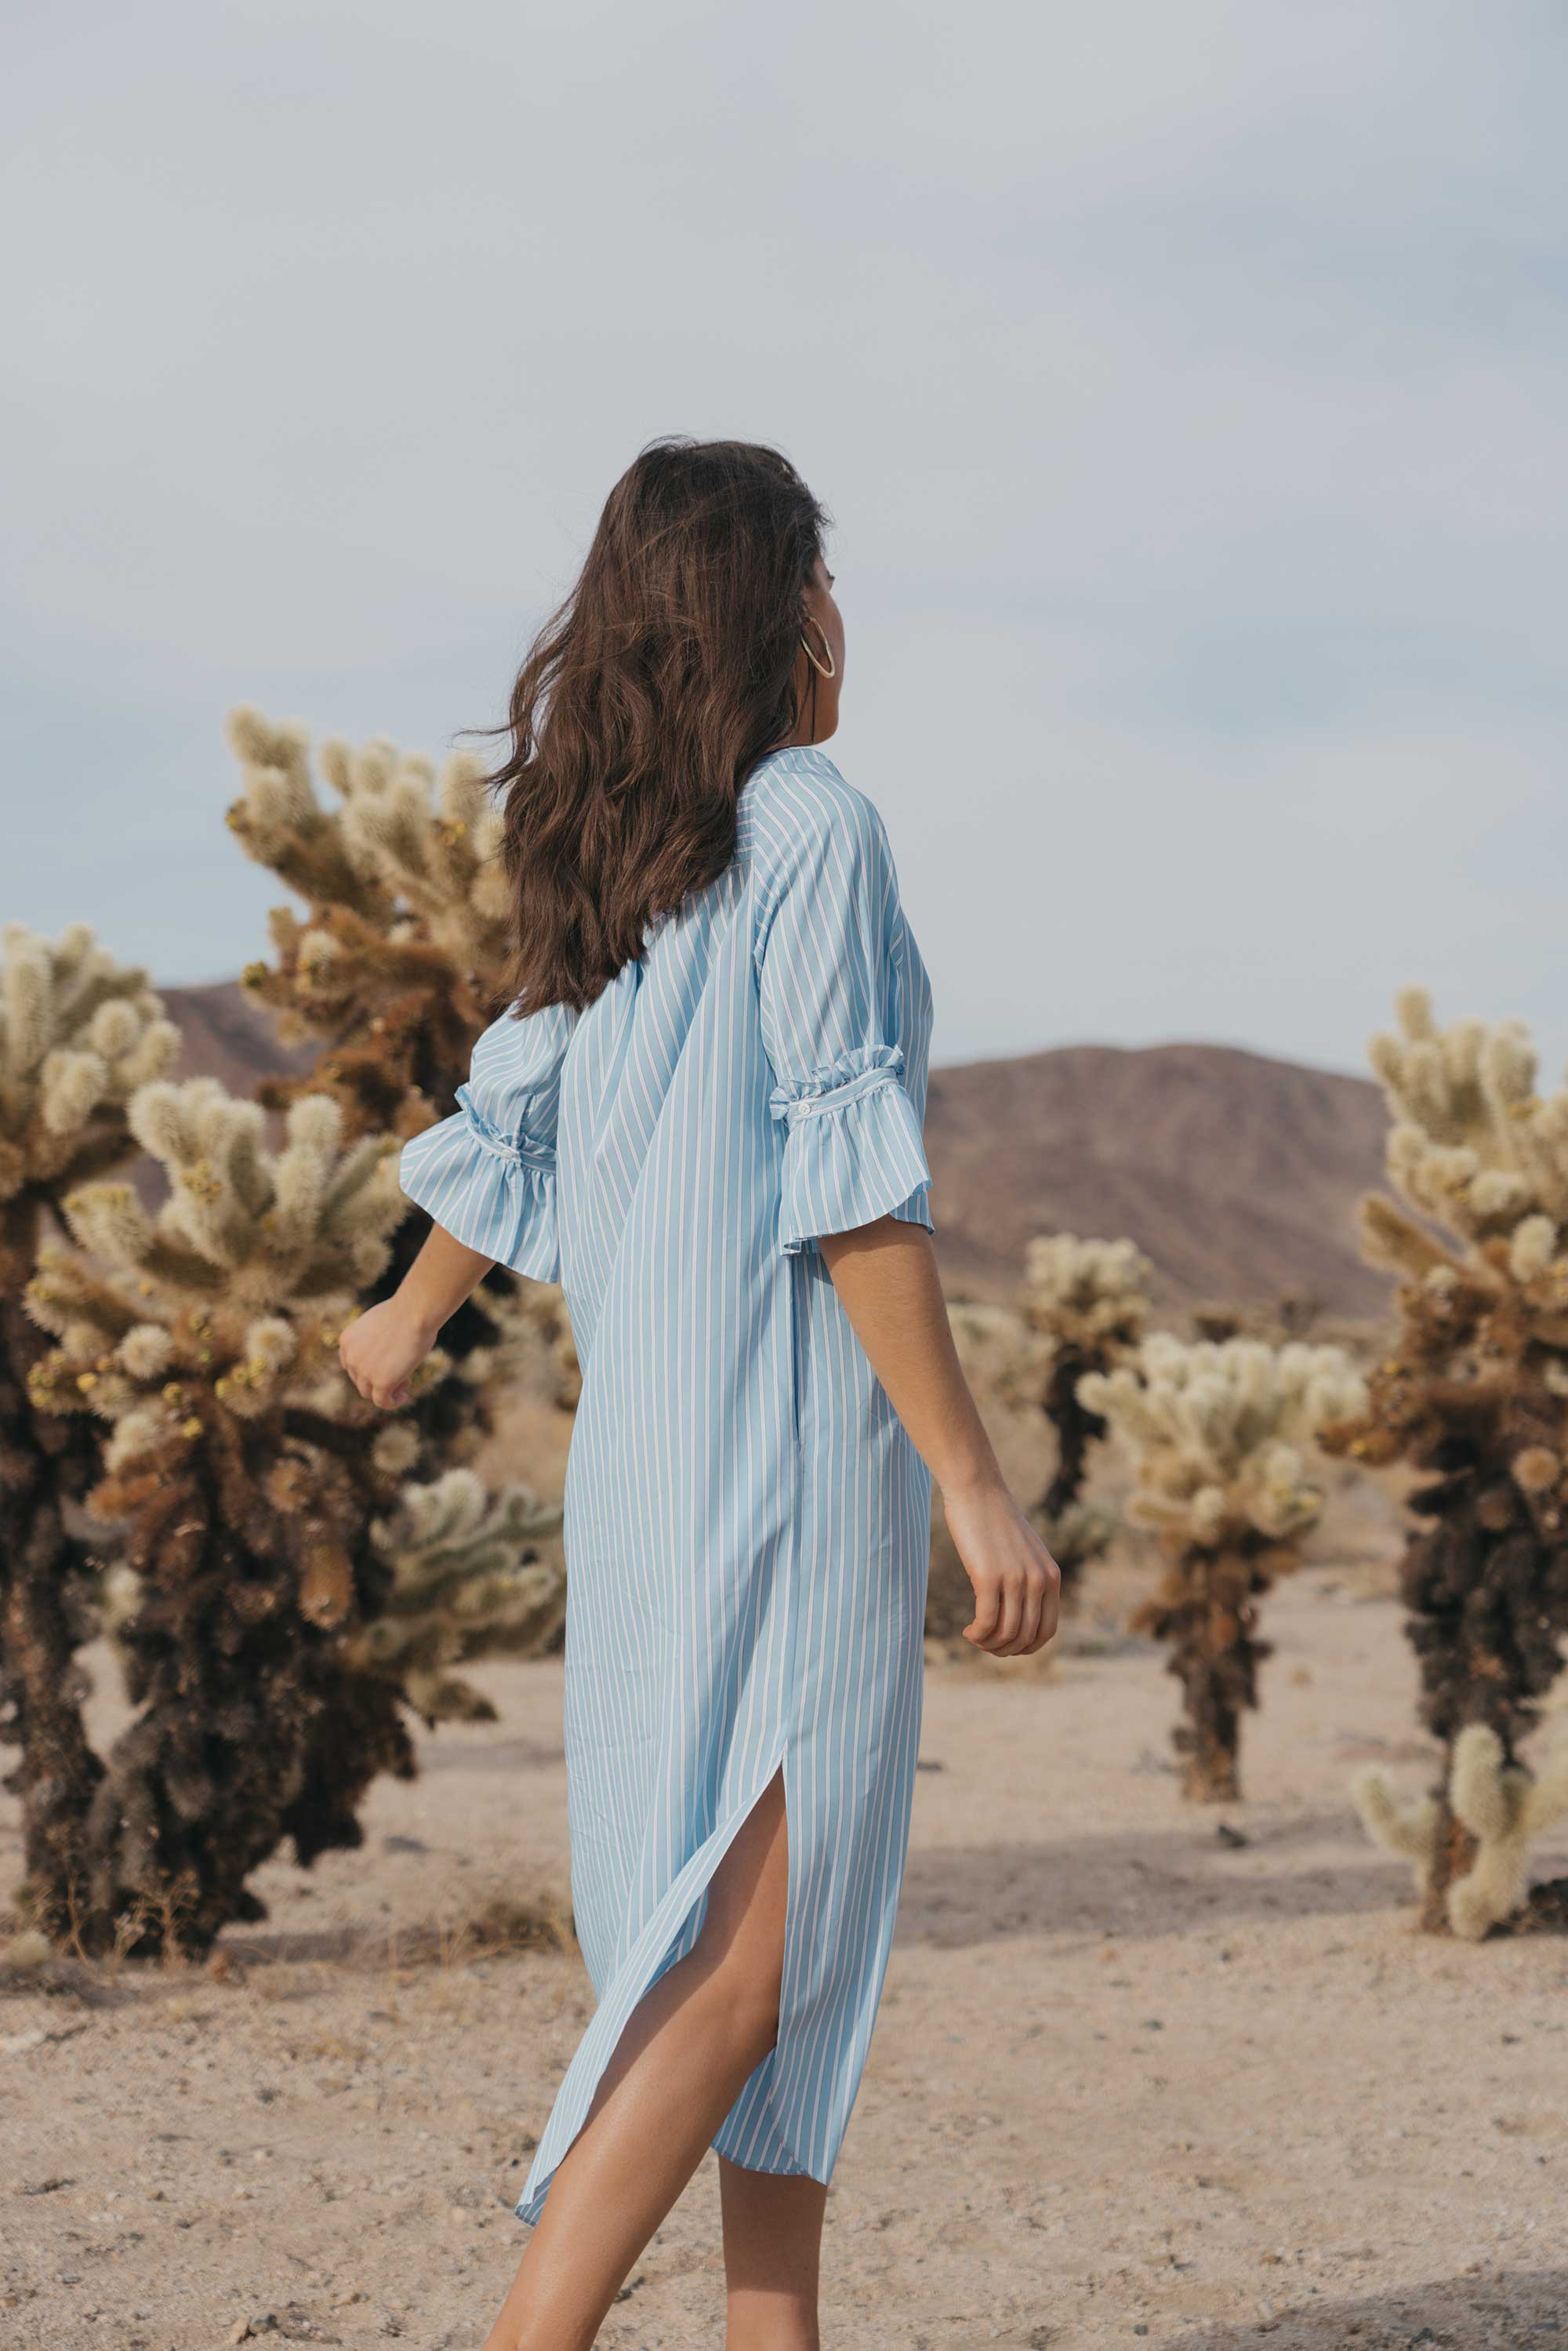 Frill Sleeve Maxi Shirt Dress Festival Outfit Coachella Joshua Tree Cholla Cactus Garden22.jpg